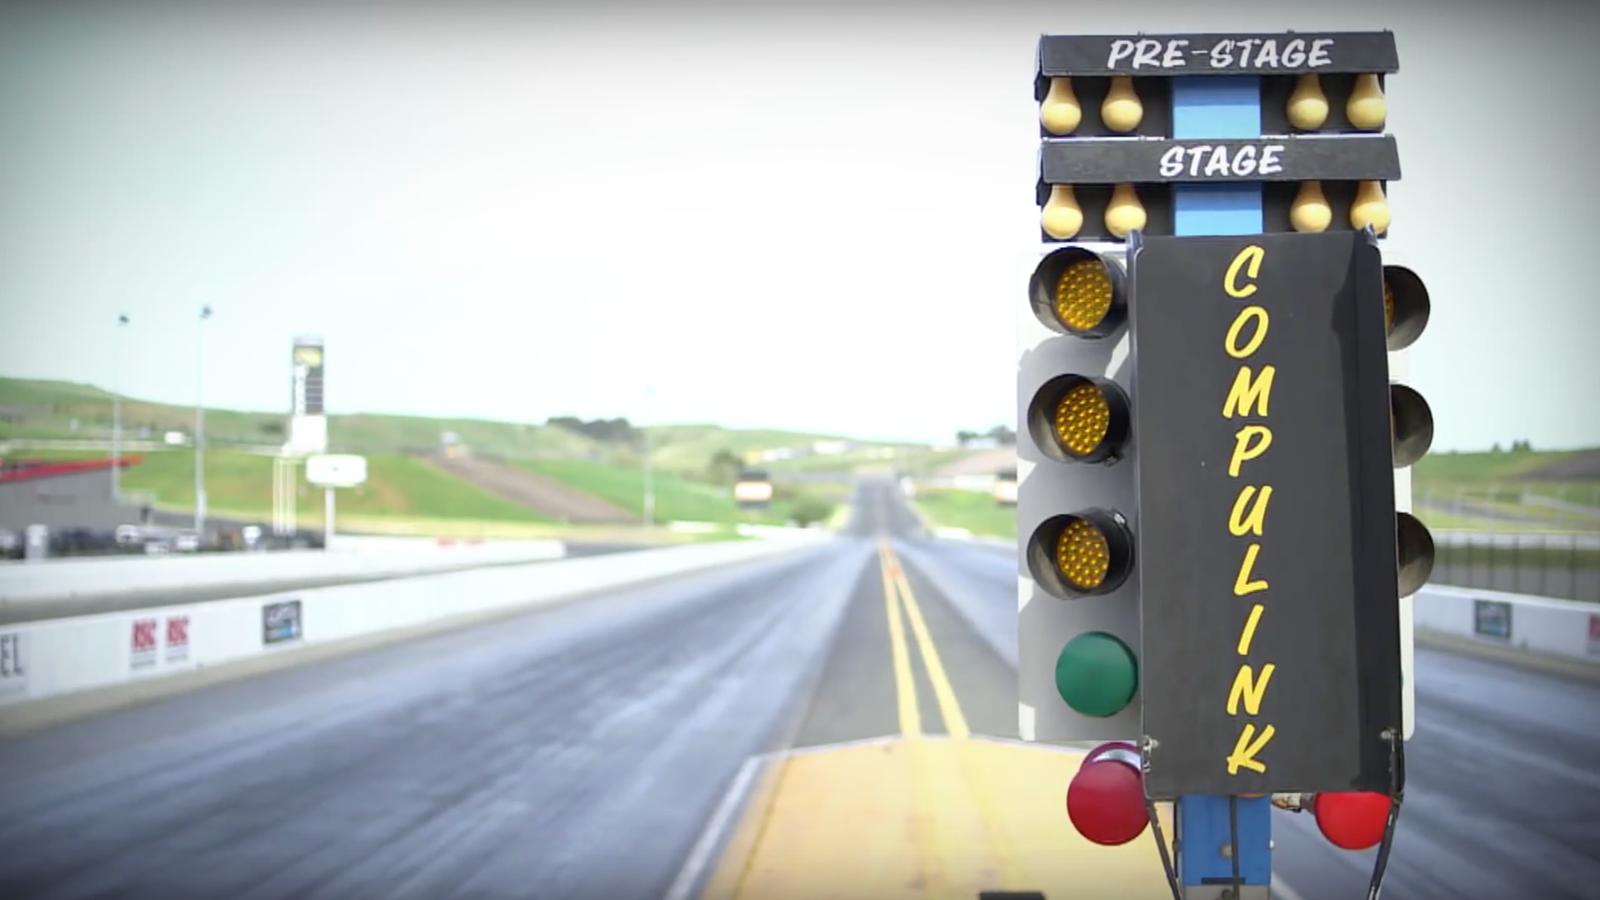 Driver Killed In 100-MPH Crash At Sonoma Raceway Drag Event